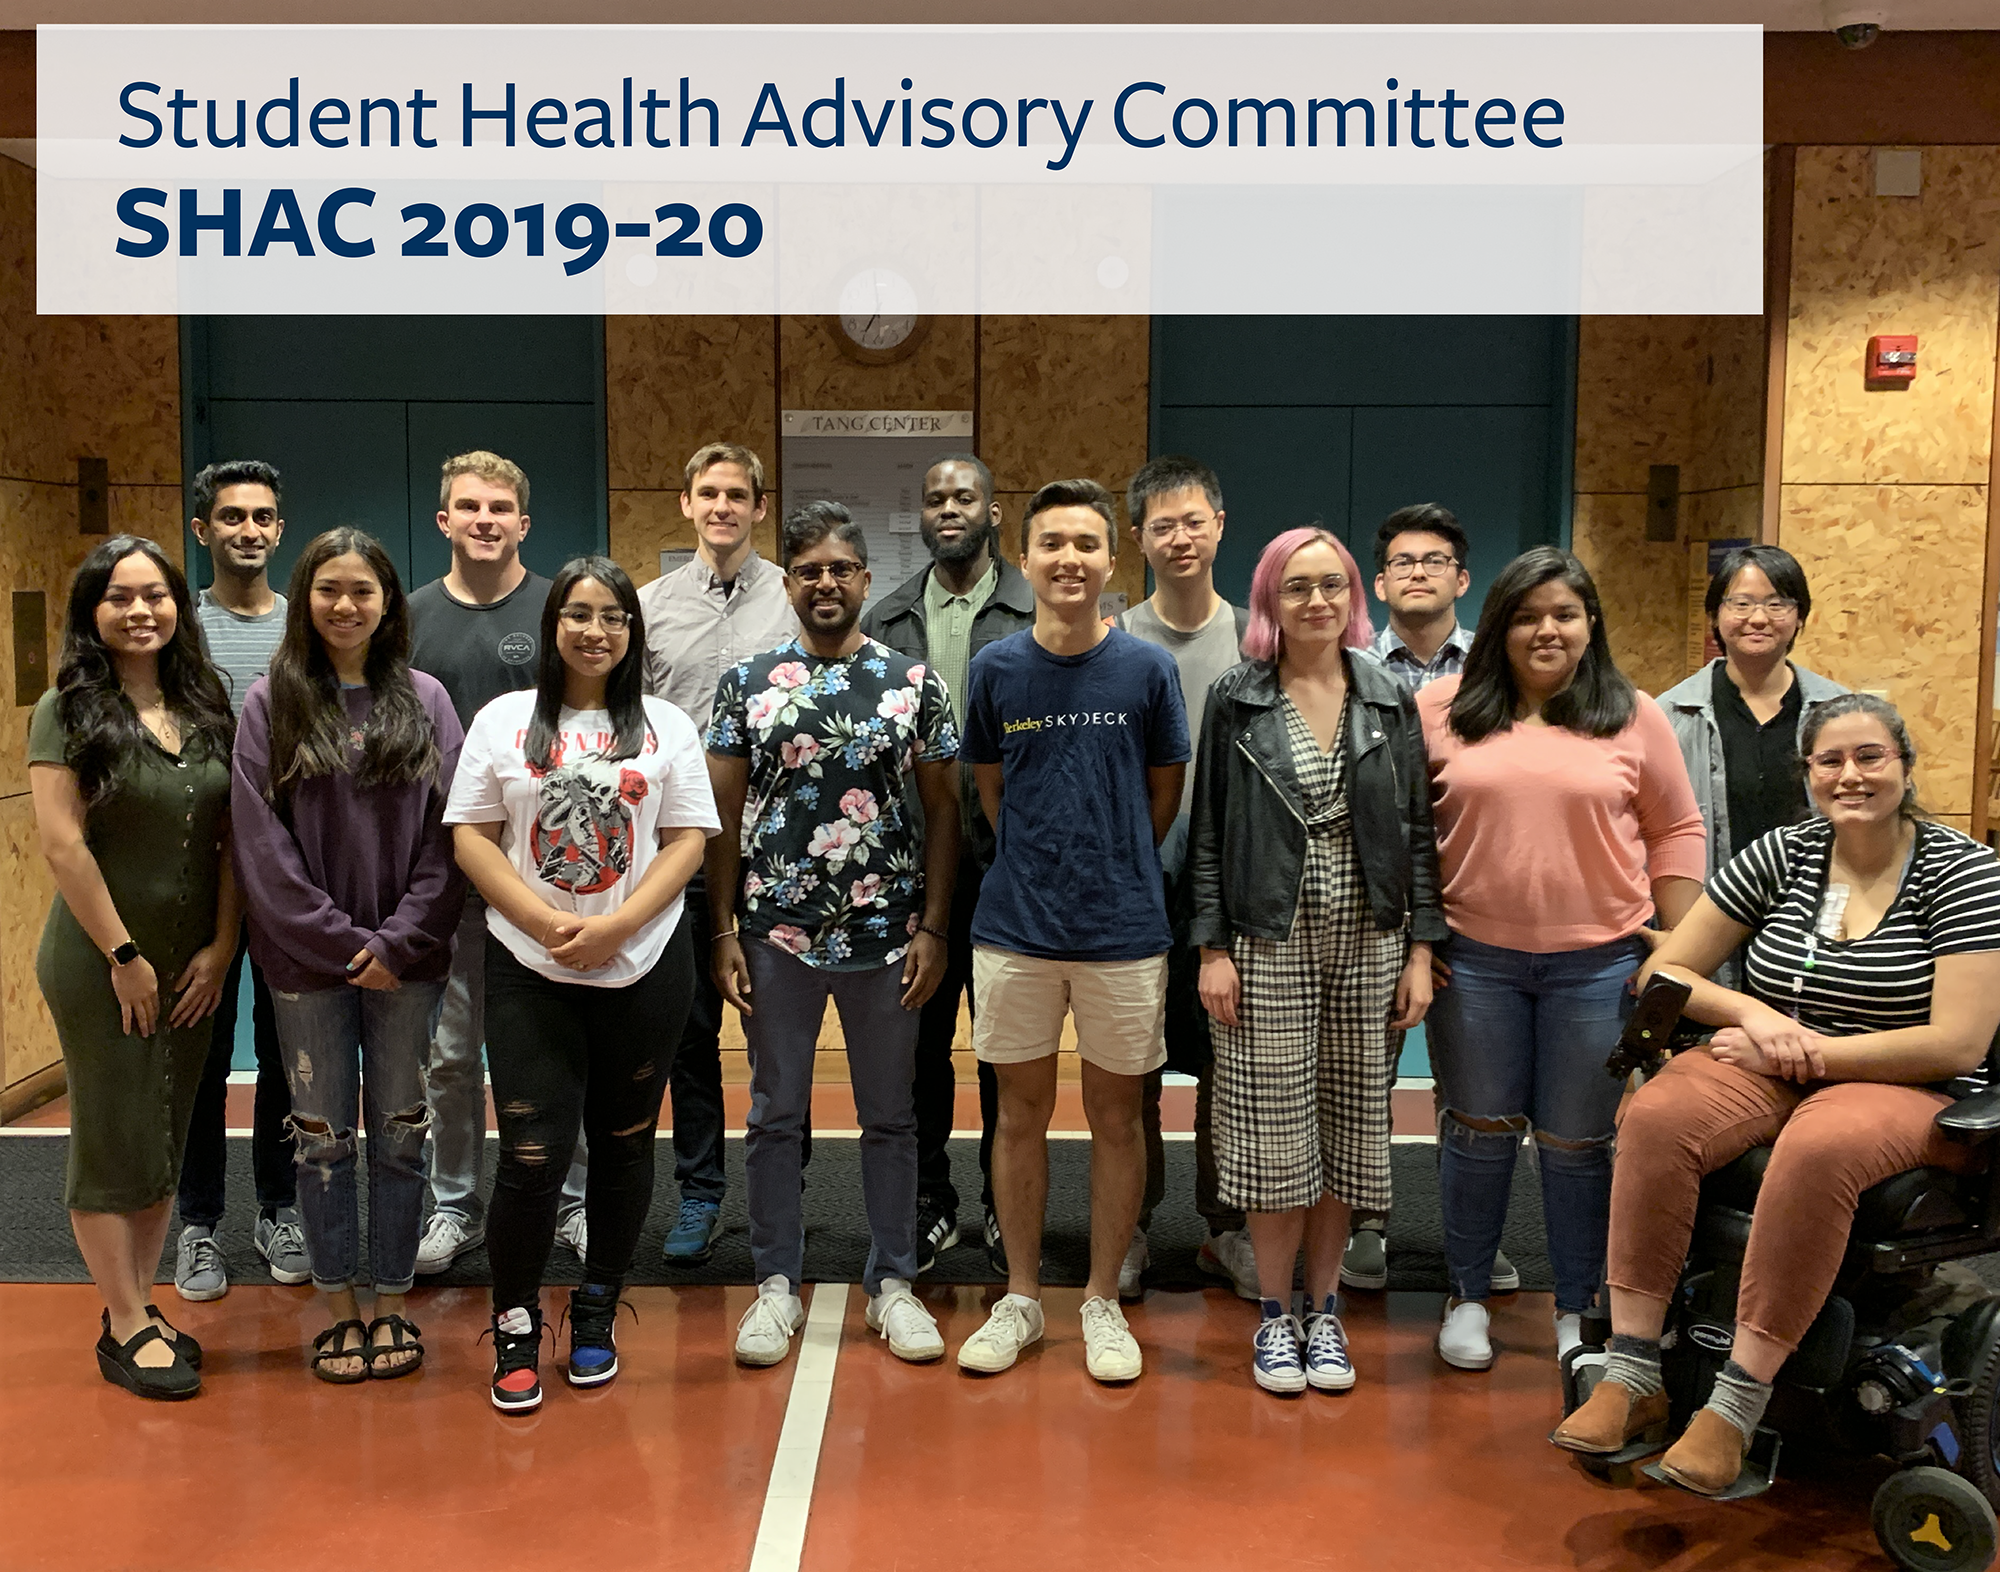 SHAC 2019-20 group photo